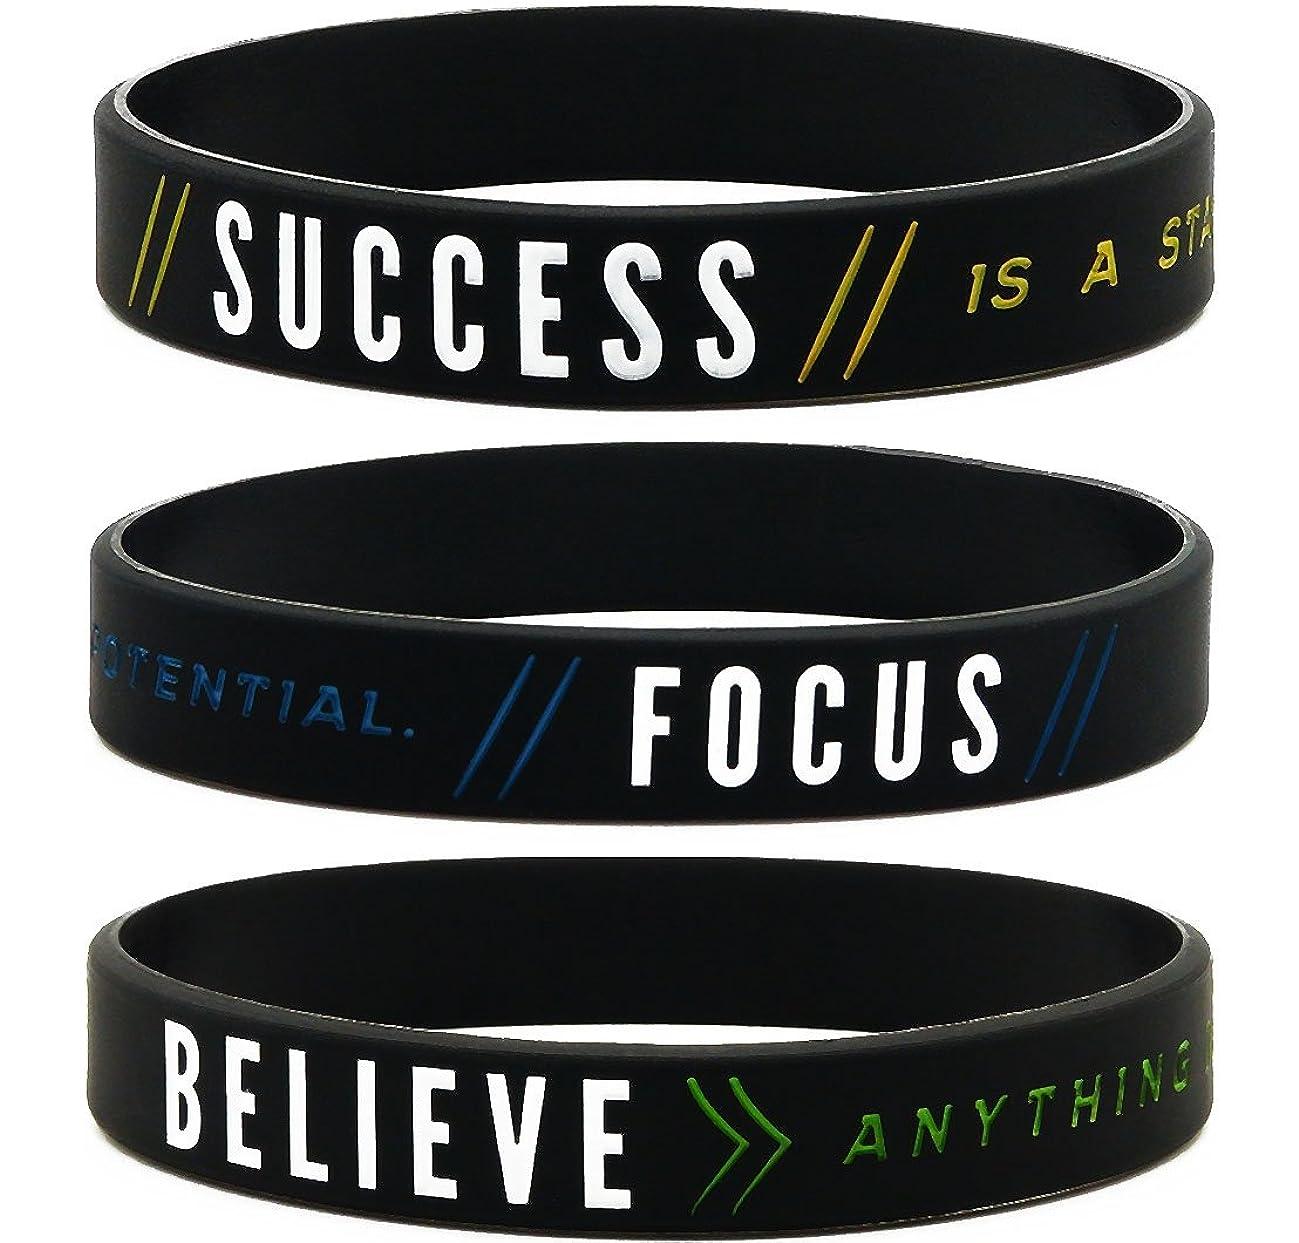 (12-pack) Motivational Silicone Wristbands -Success, Focus & Believe Wholesale Bulk Pack of 12 Silicone Bracelets - Motivation Encouragement Achievement Gifts Party Favors for Adults